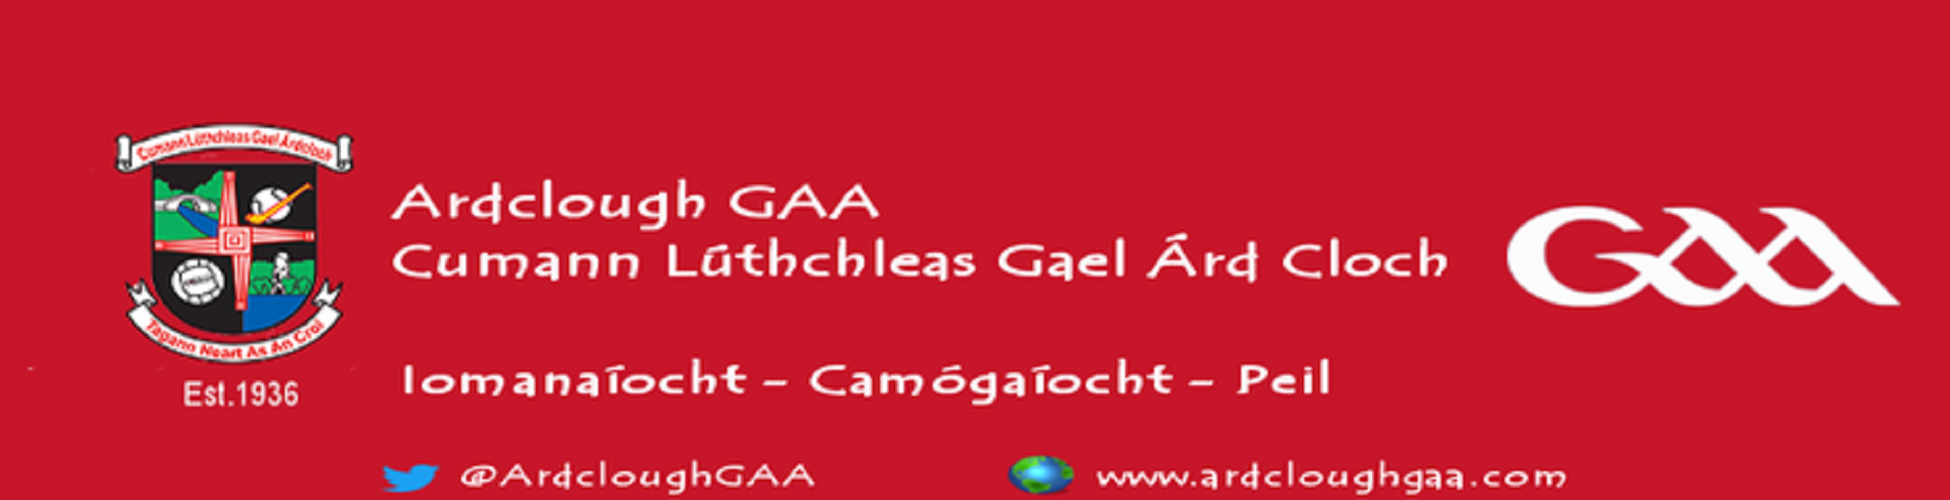 ardcloughgaa.com logo